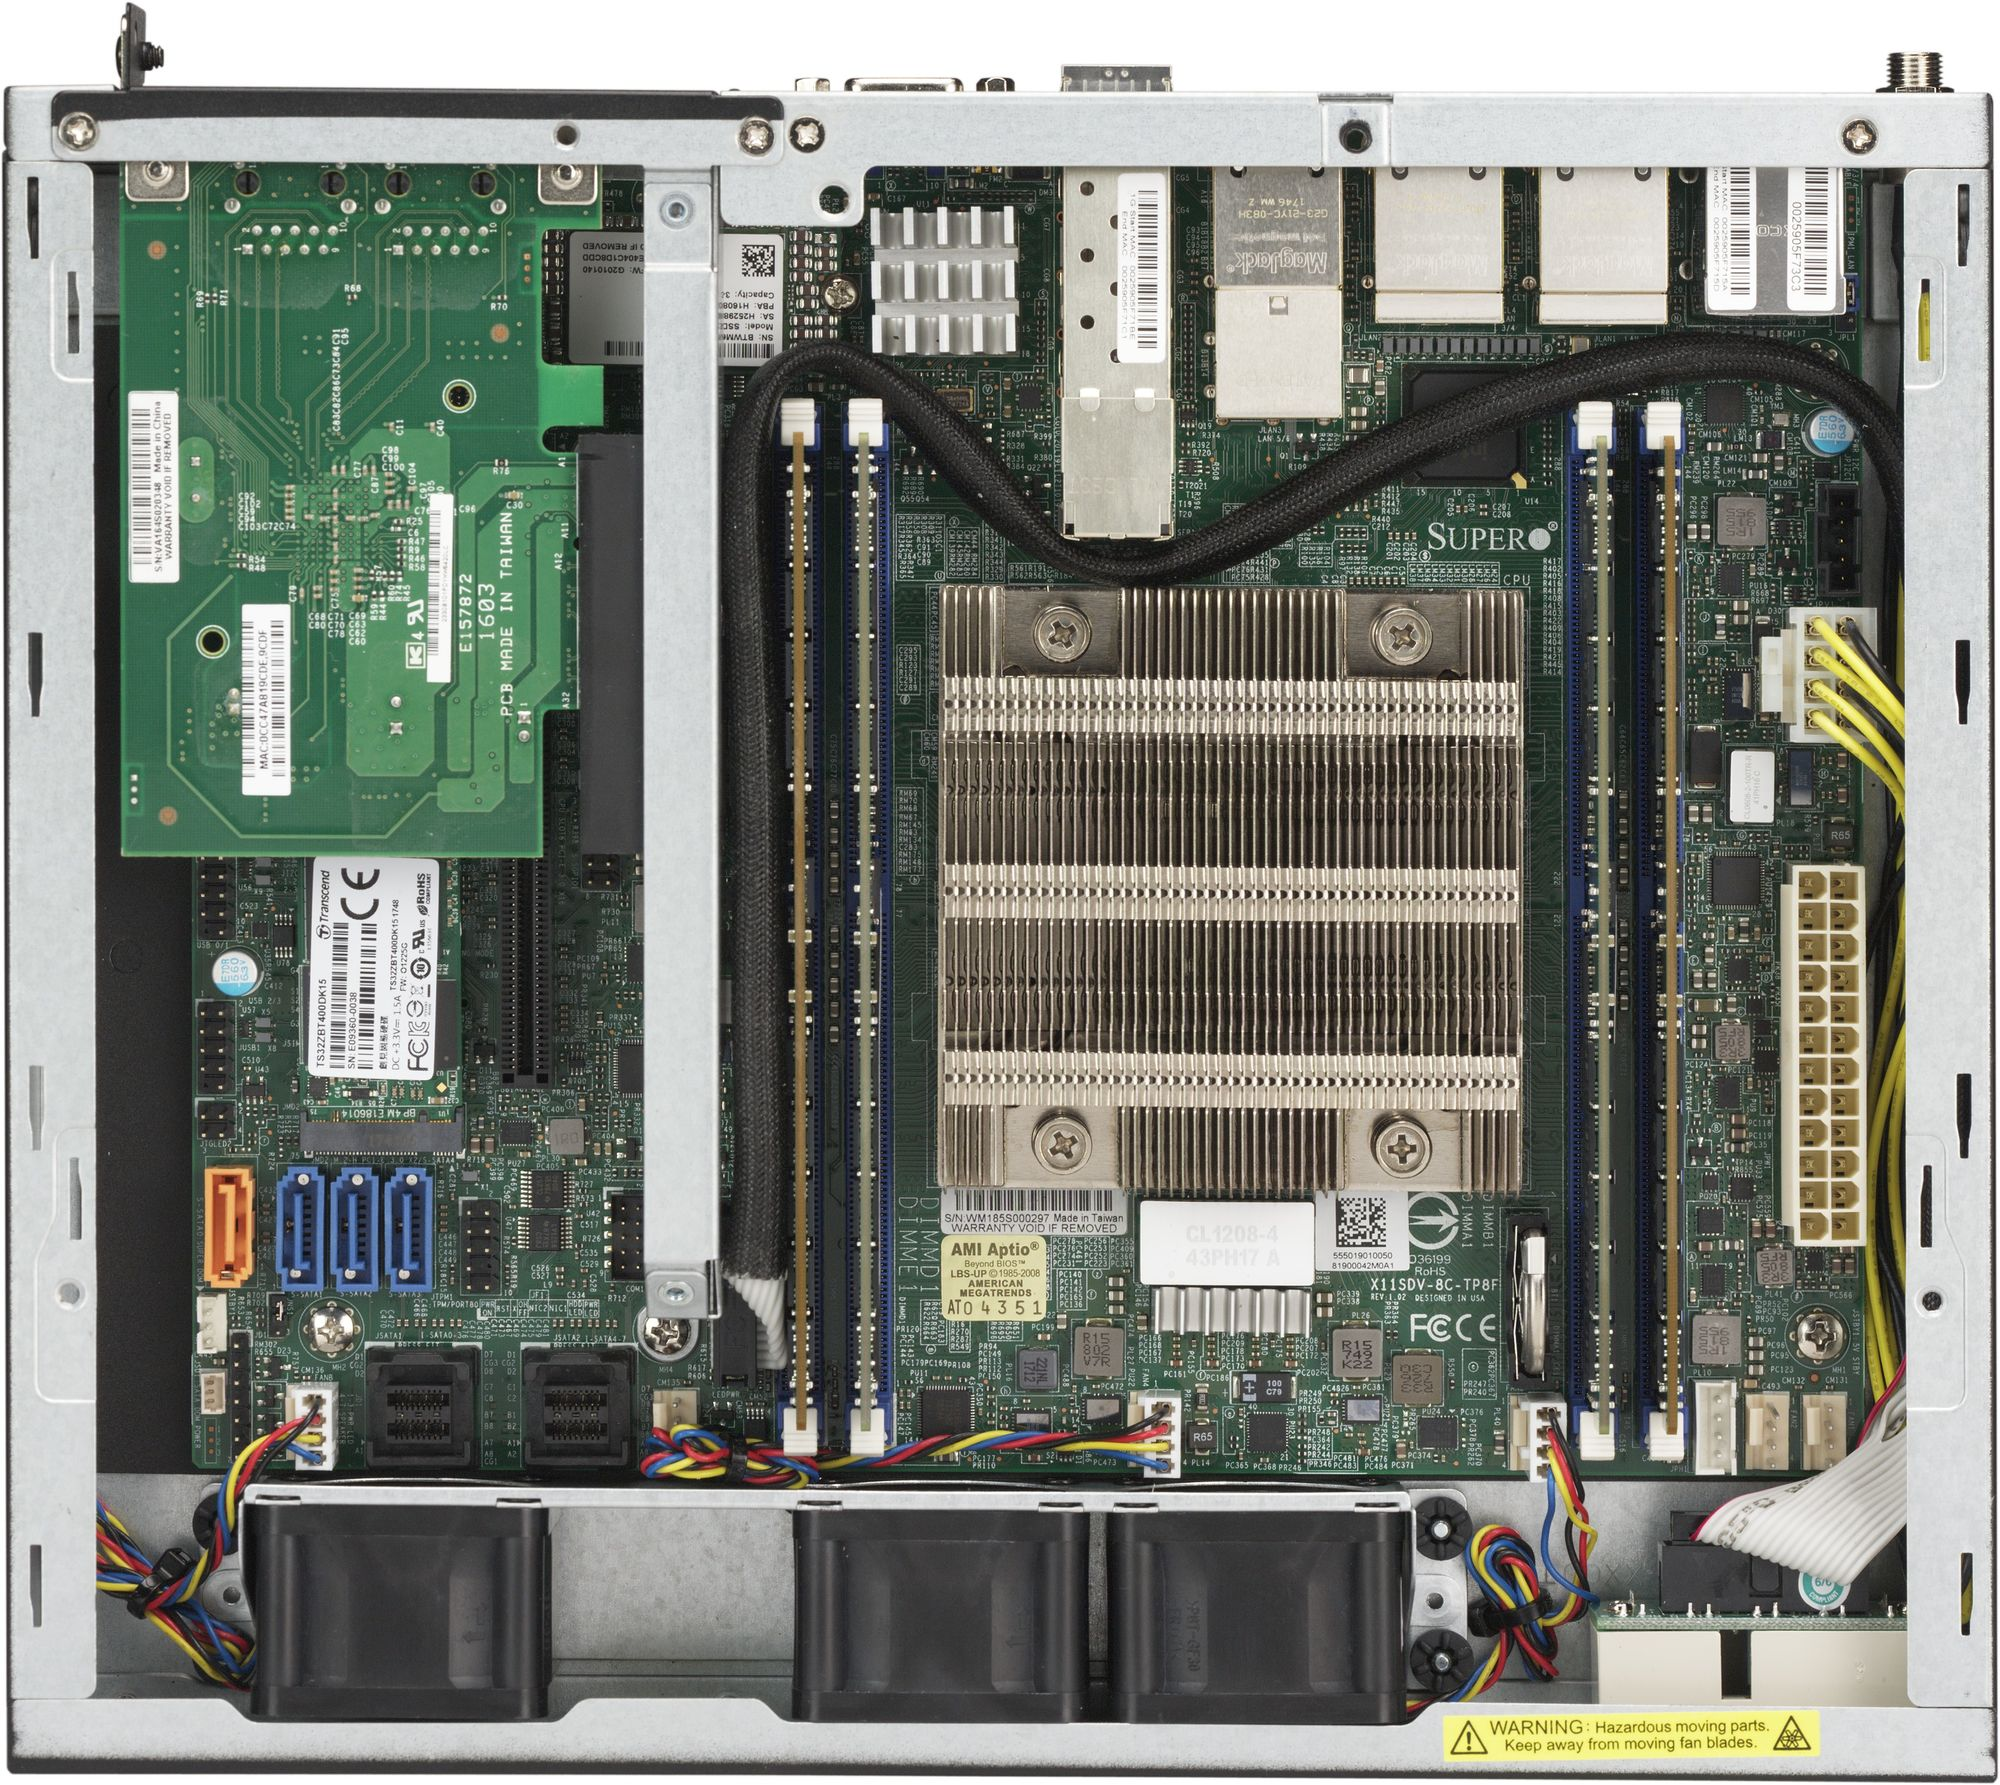 Supermicro Embedded SYS-E300-9D-4CN8TP - miniserver or 1U rackmountable -  IoT